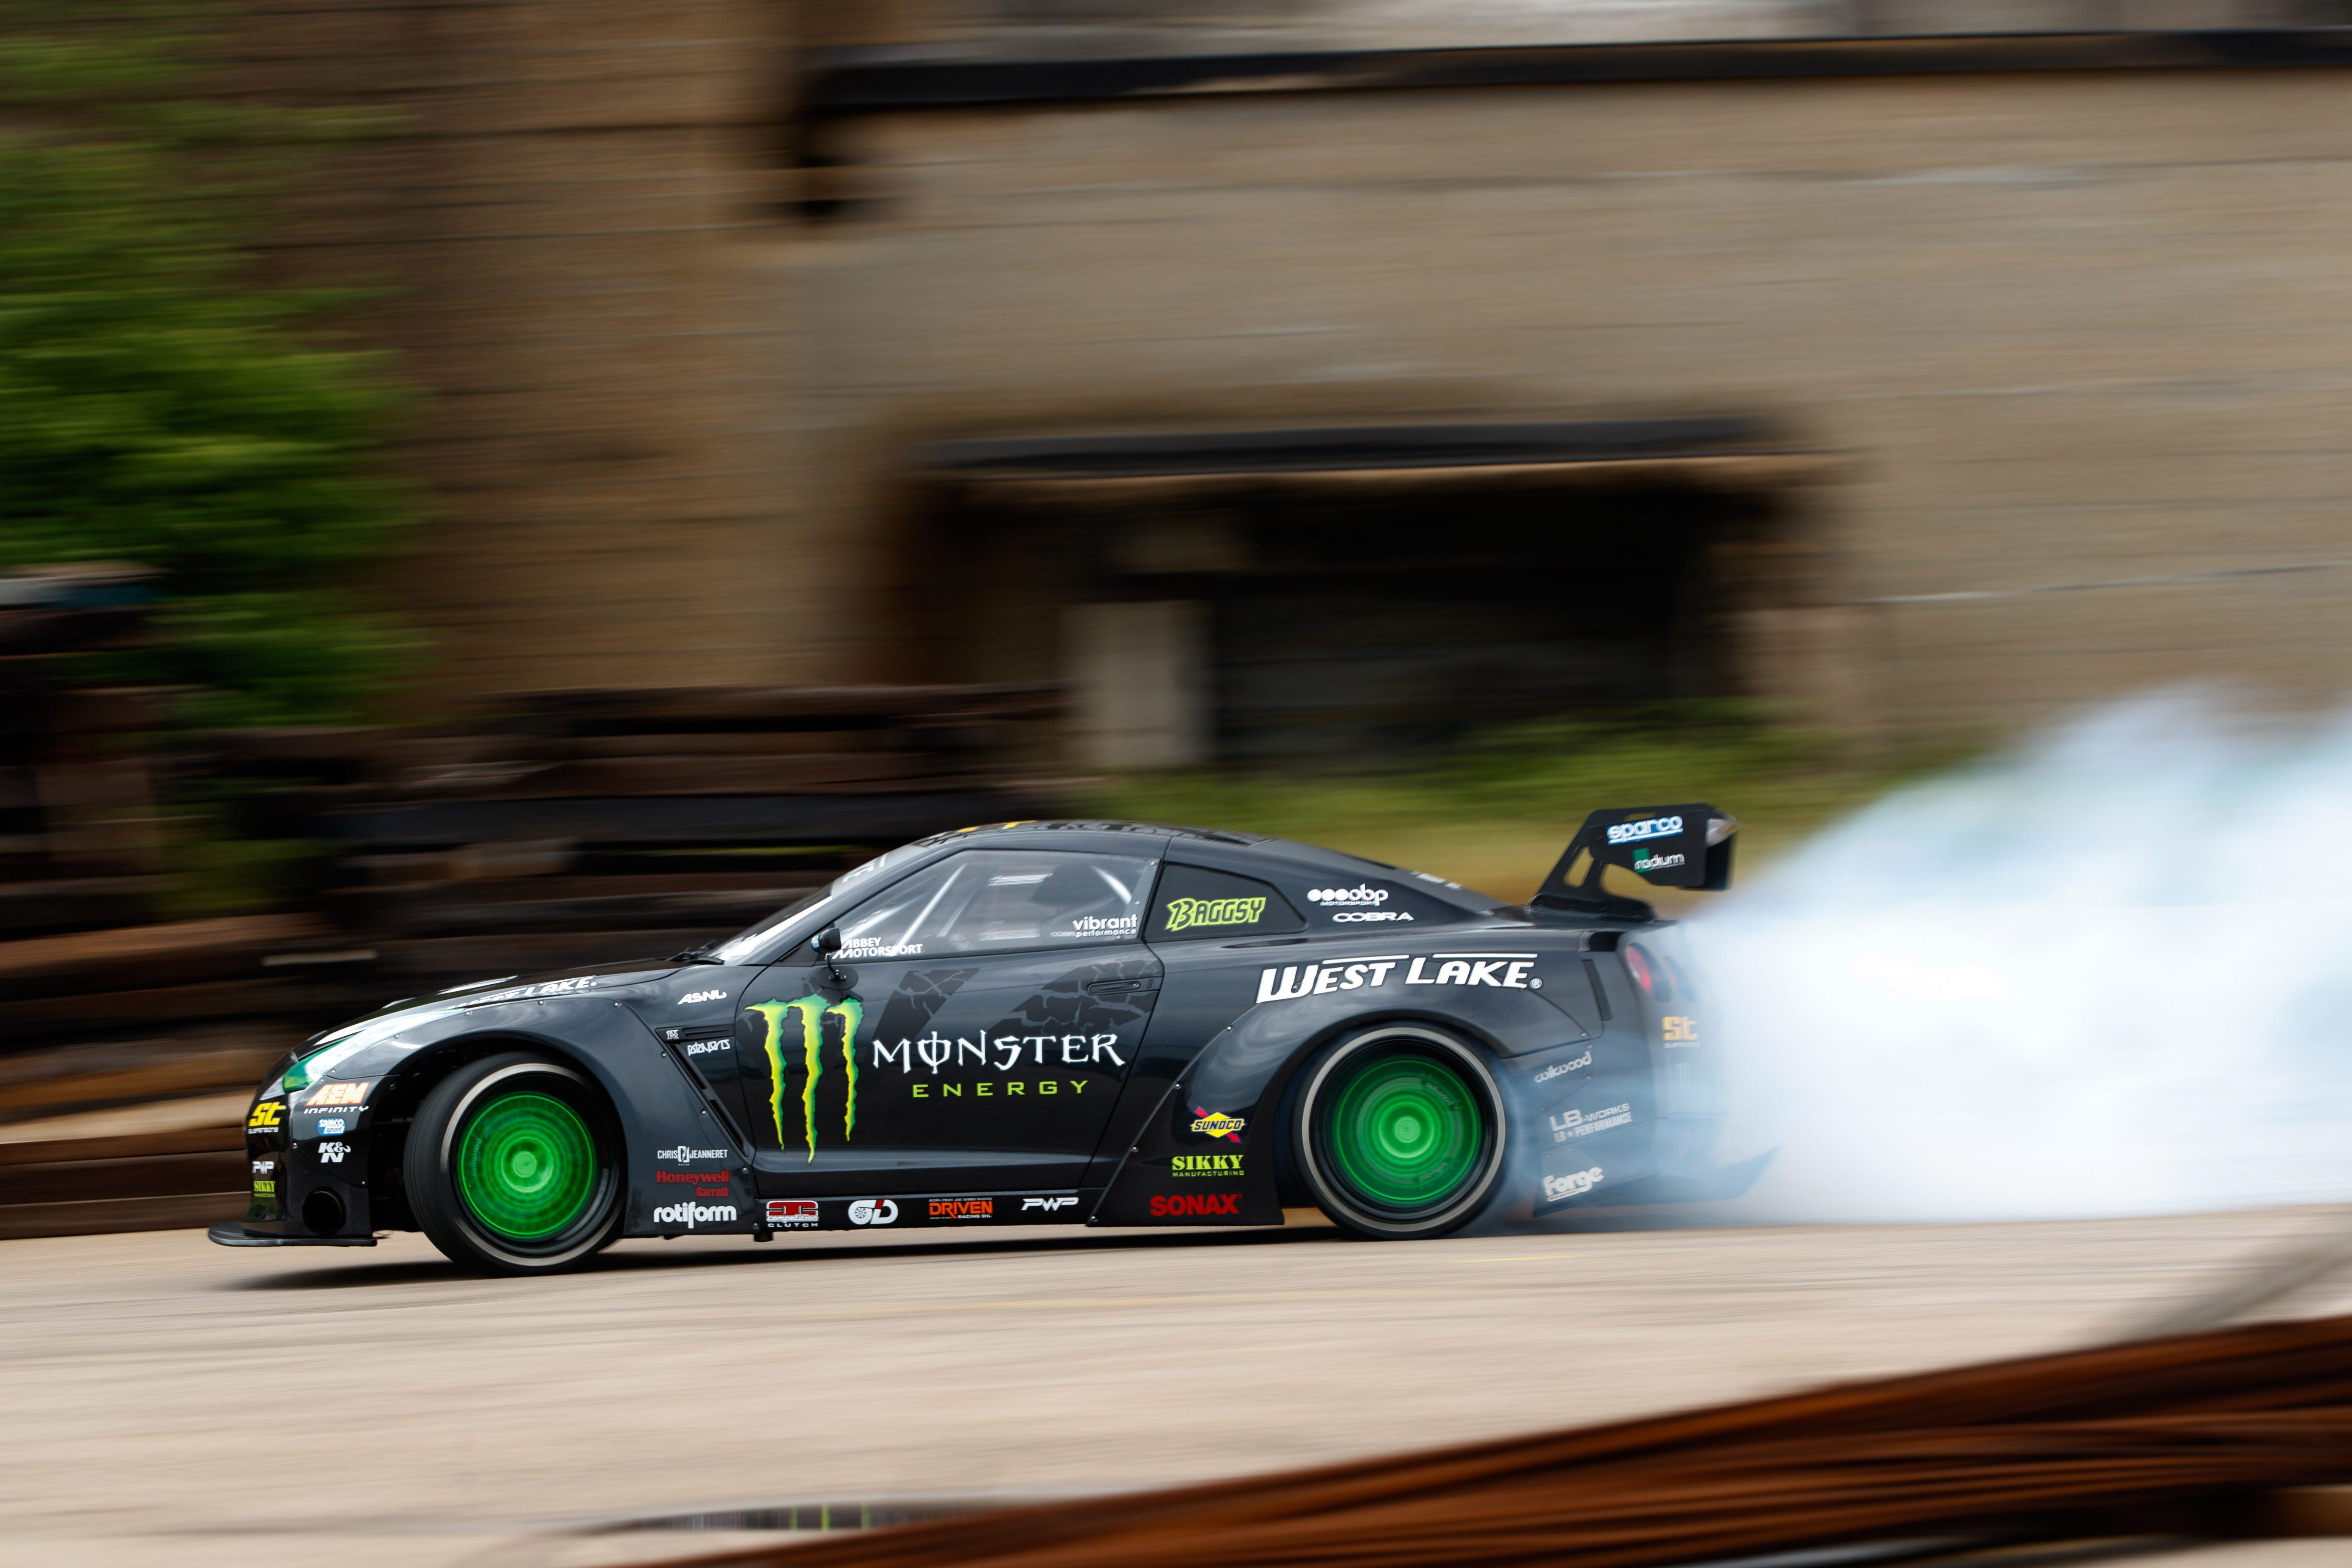 Monster Energy og Auto Show Denmark i unikt samarbejde